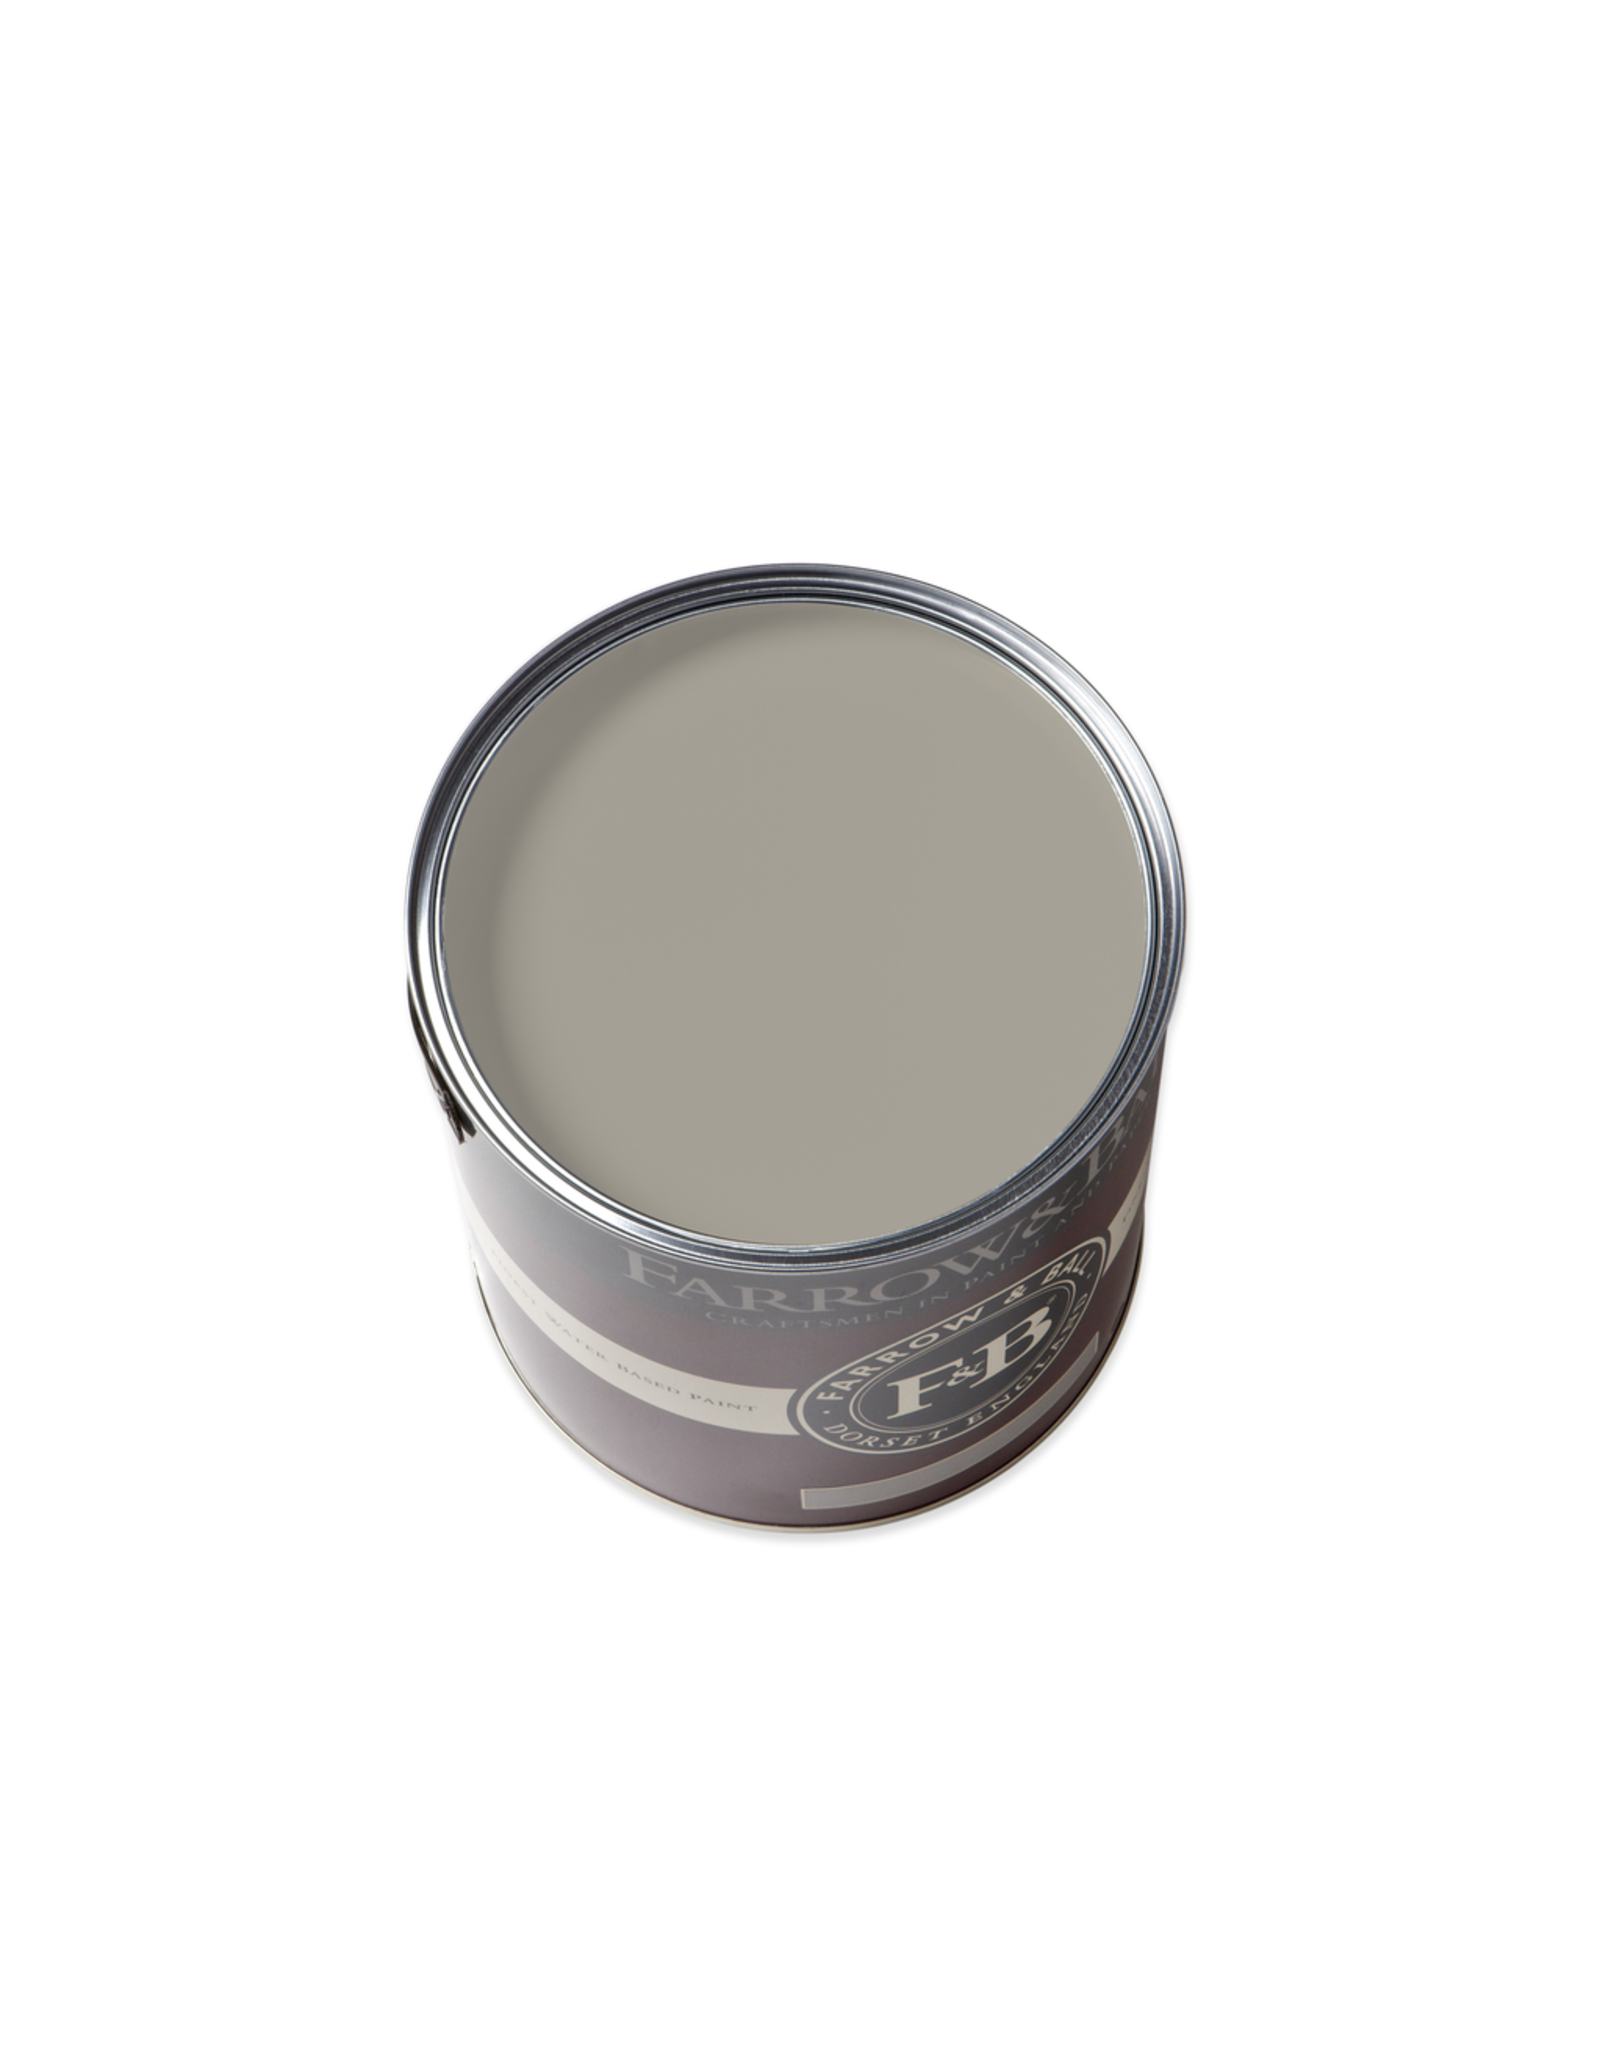 Farrow and Ball Gallon Modern Emulsion Hardwick White No. 5